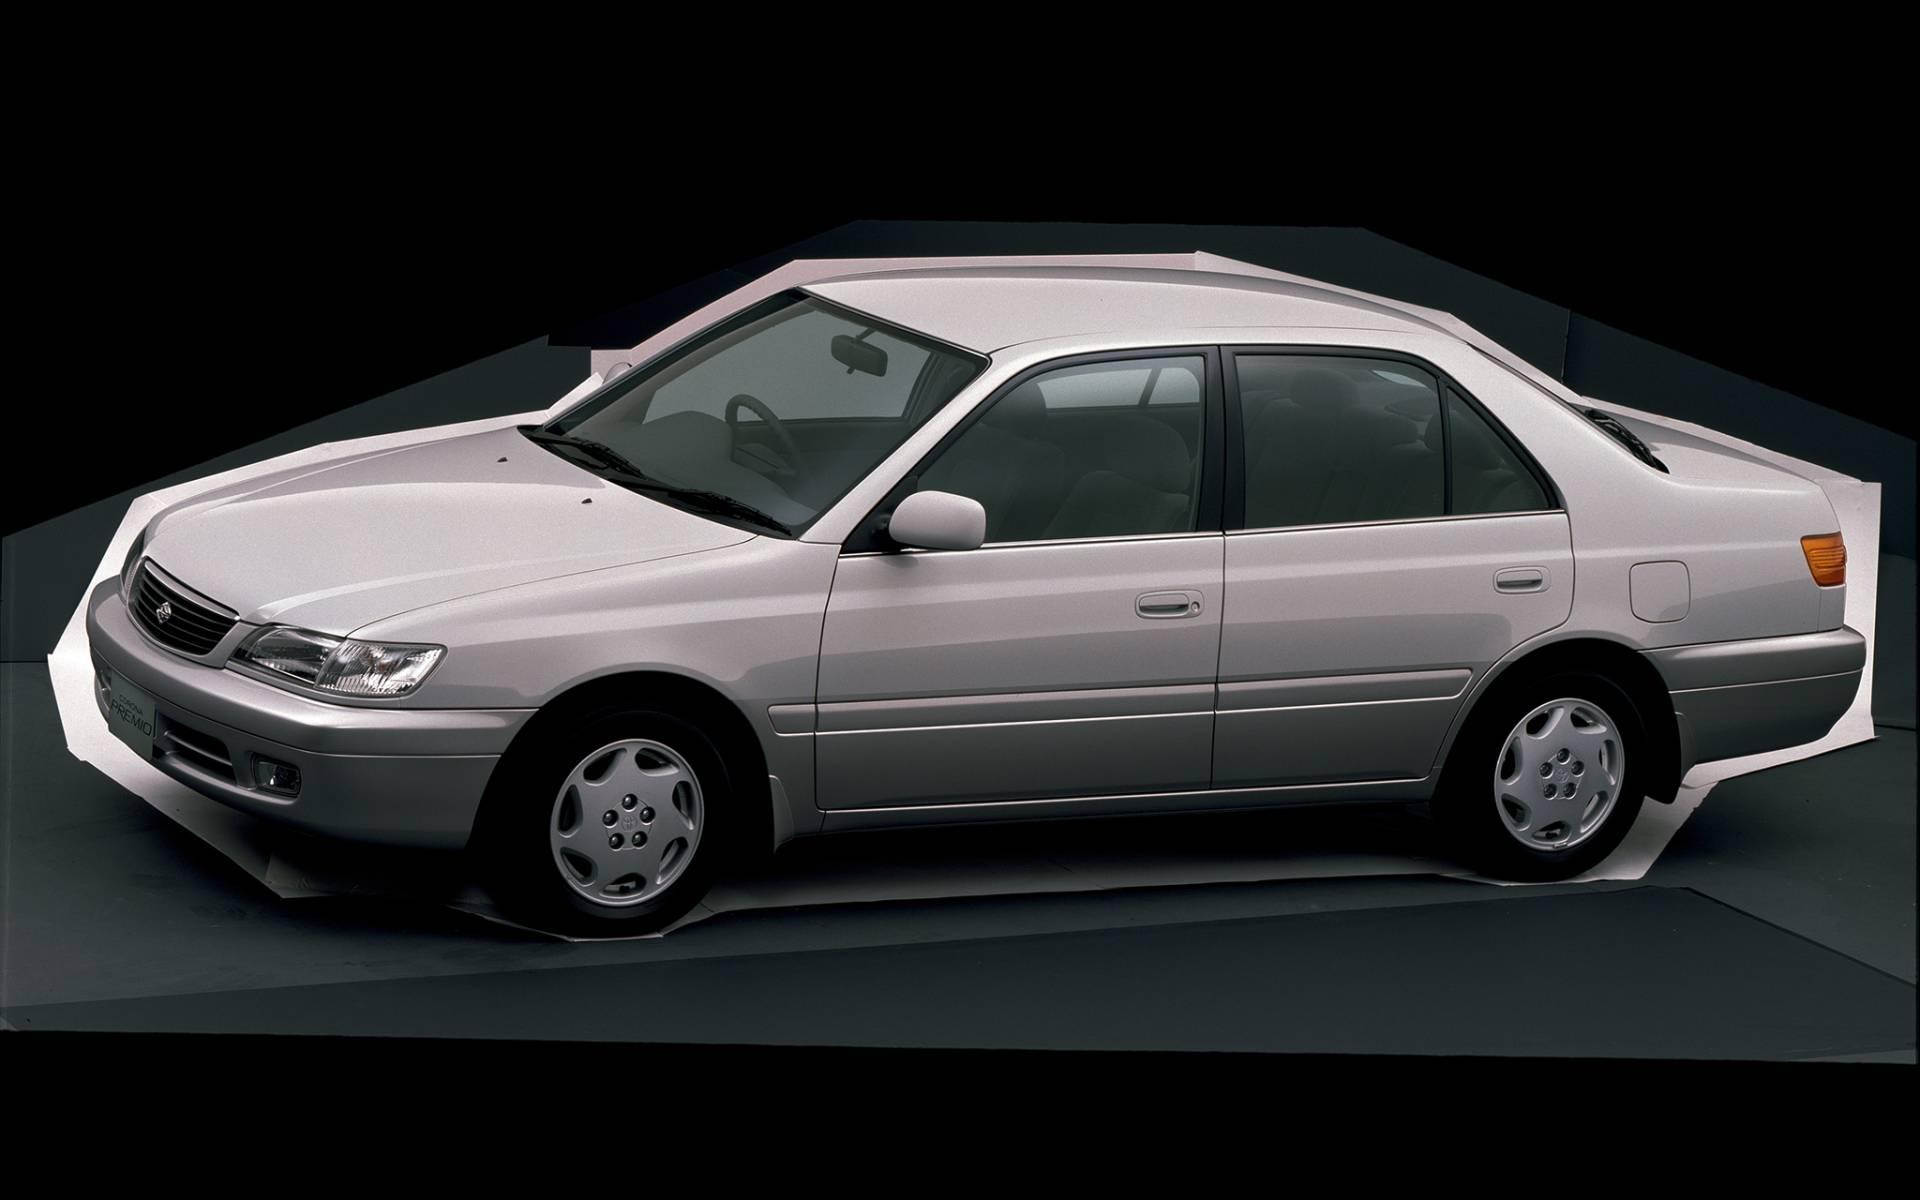 <p>10th generation (1996-2001)</p>